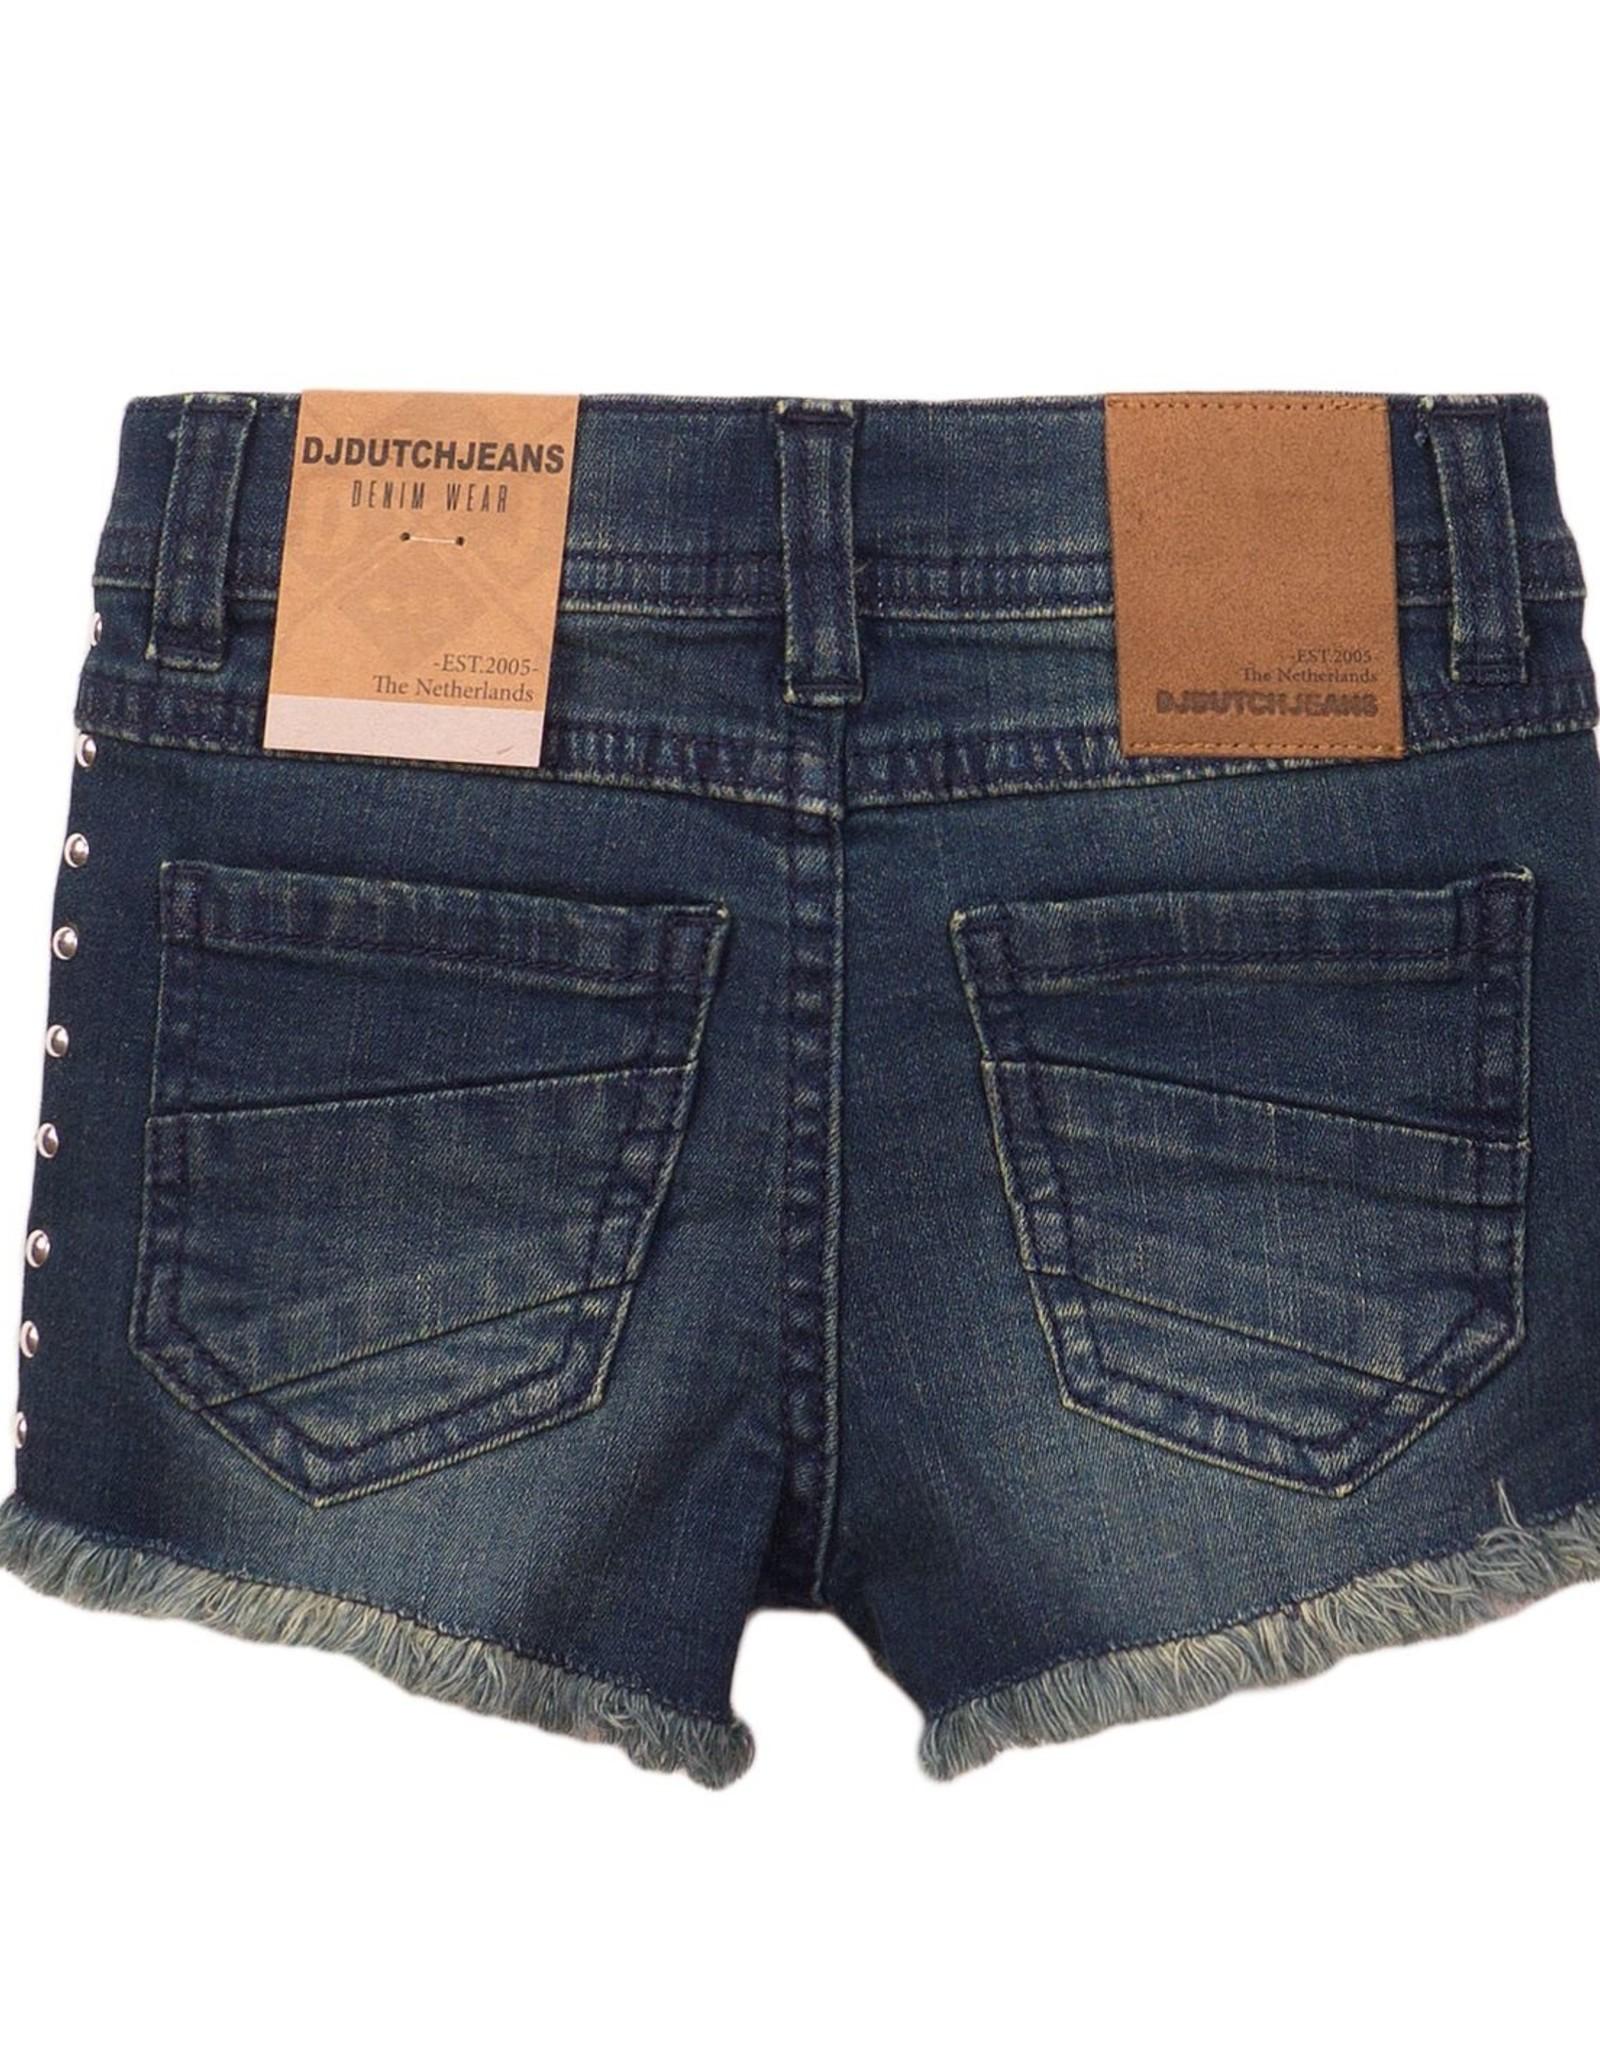 DJ Dutchjeans DJ Dutchjeans short 38055 jeans